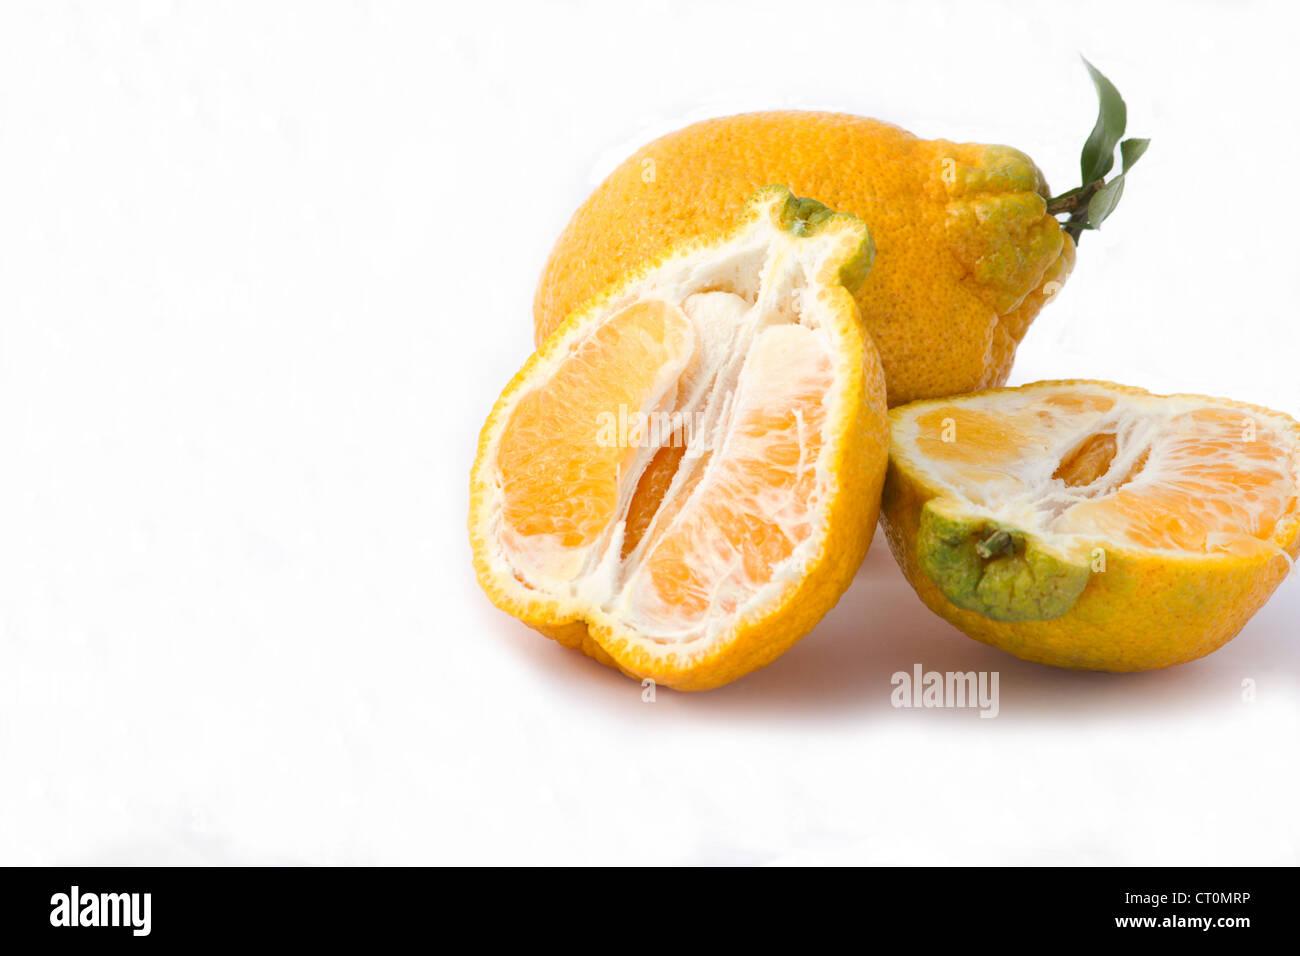 Fresh dekopom oranges on white background - Stock Image